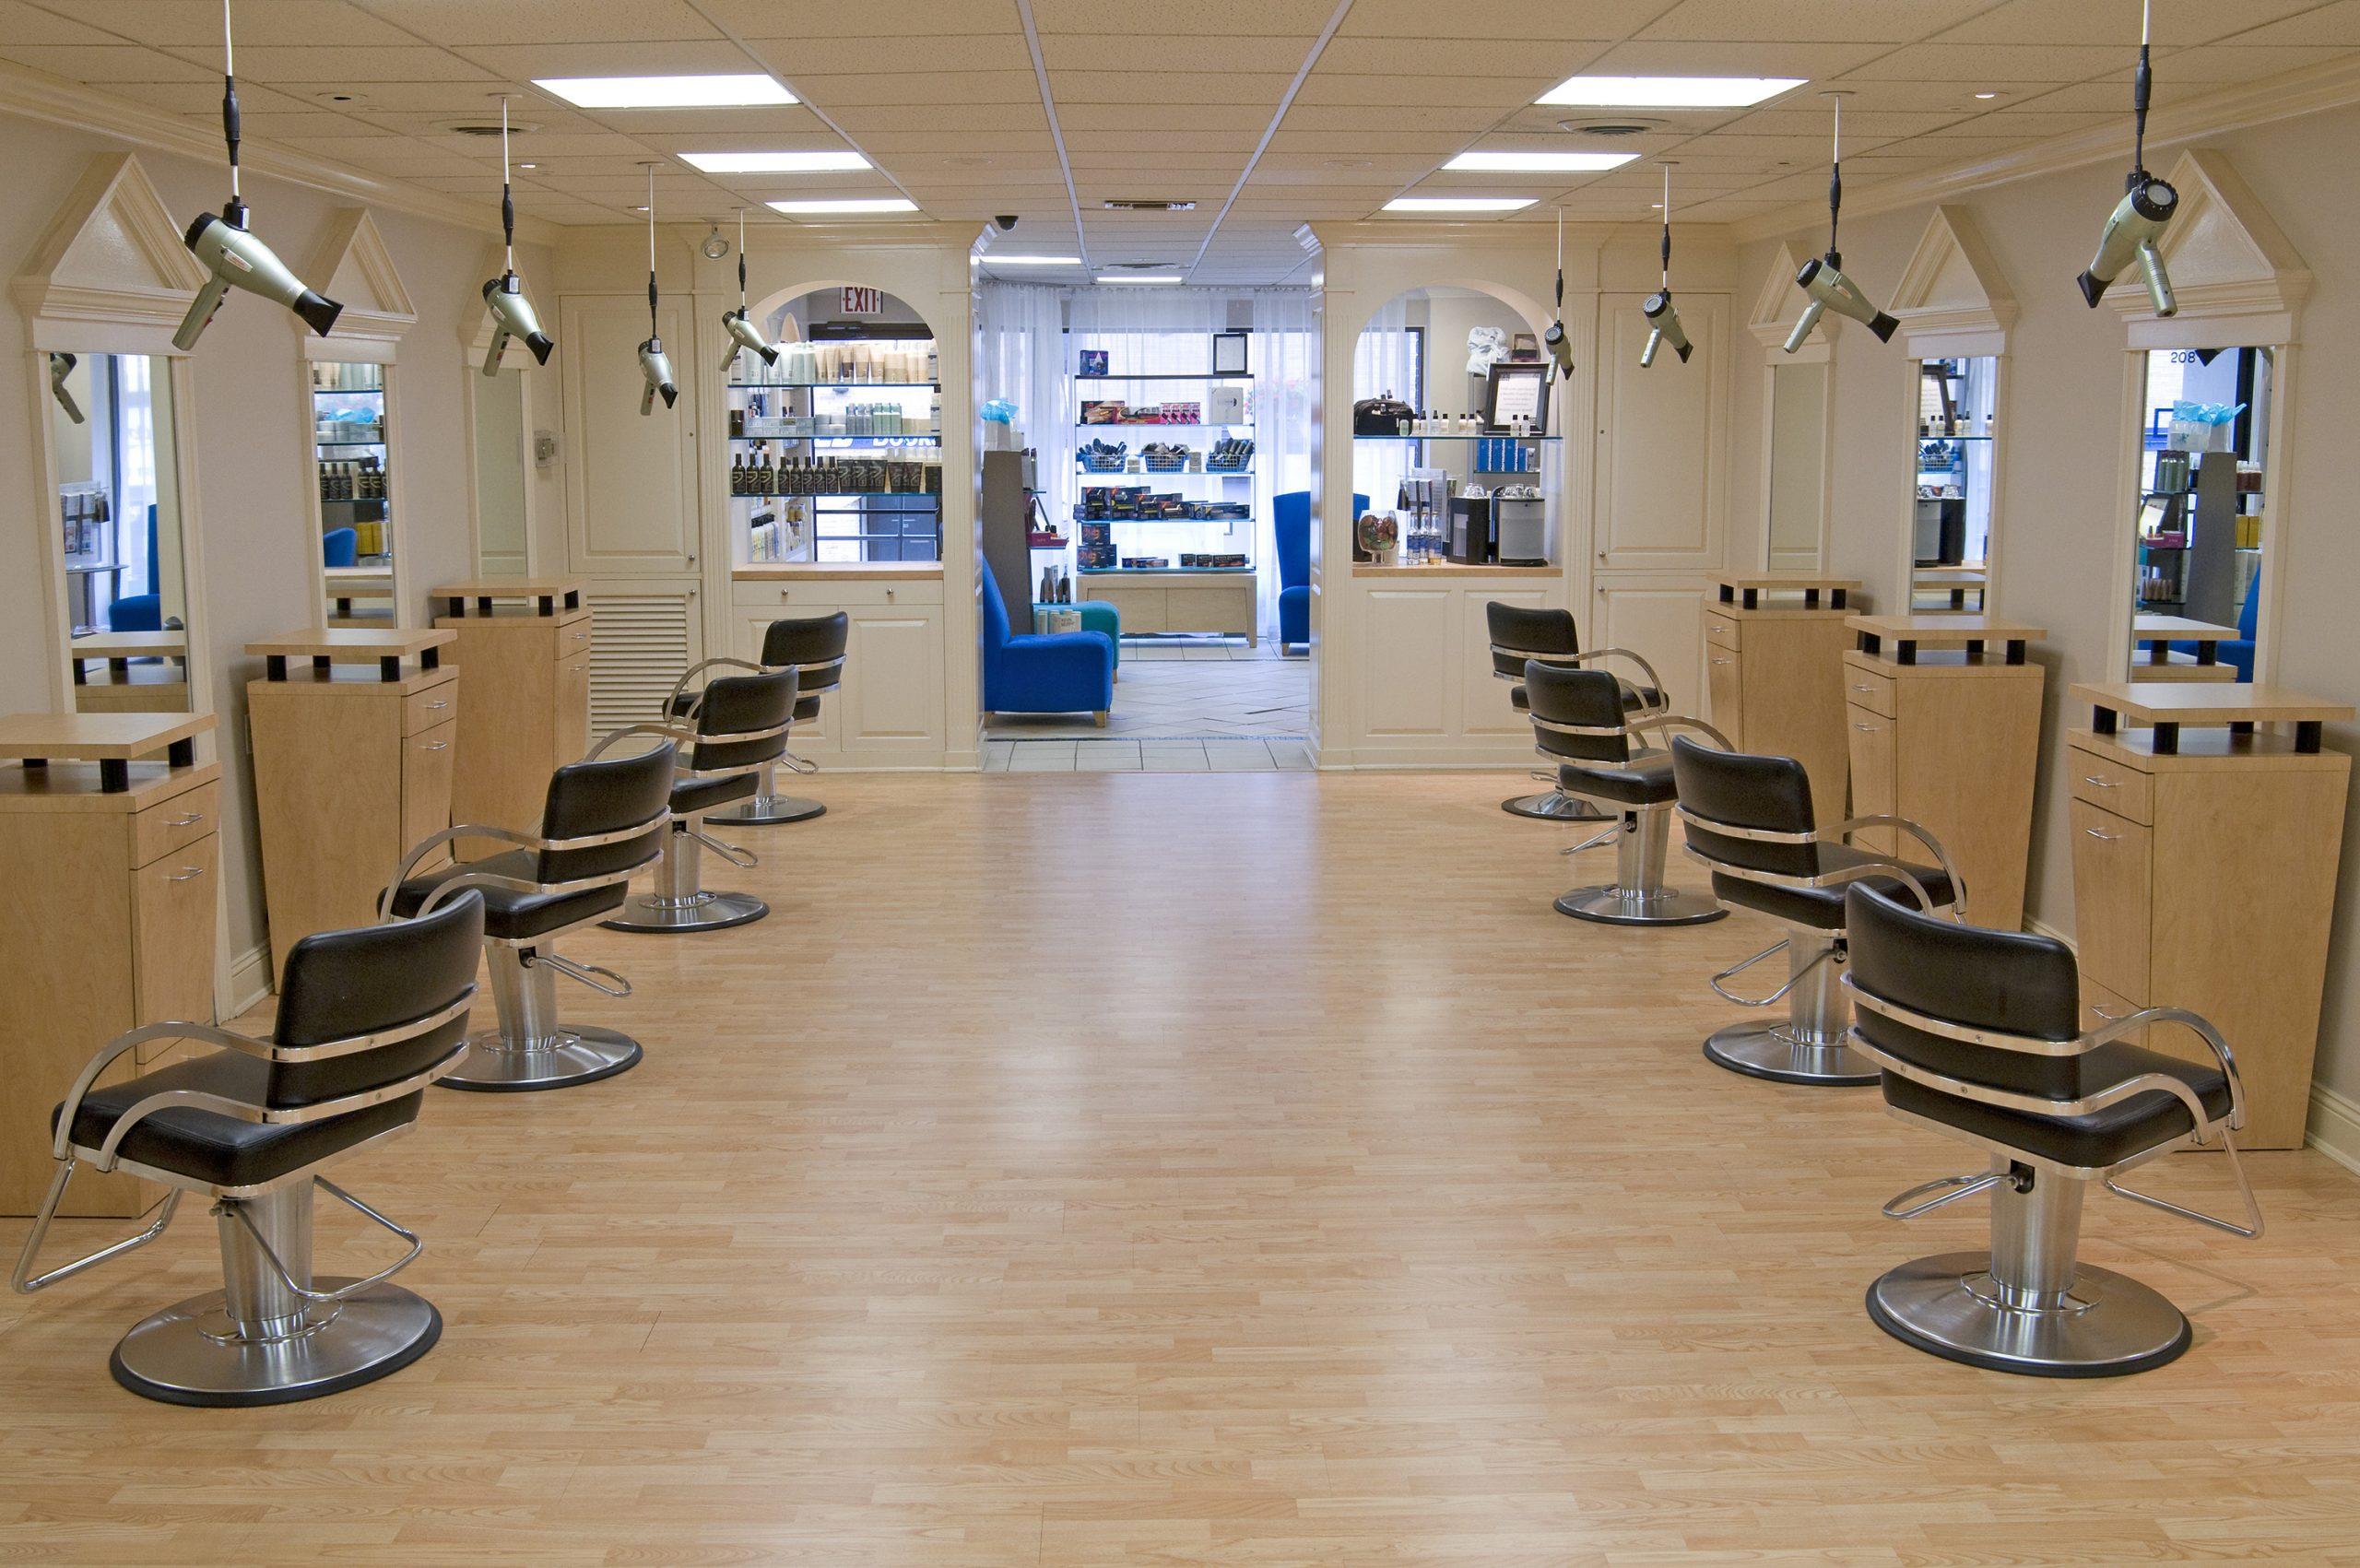 Designer's Denn Salon and Spa